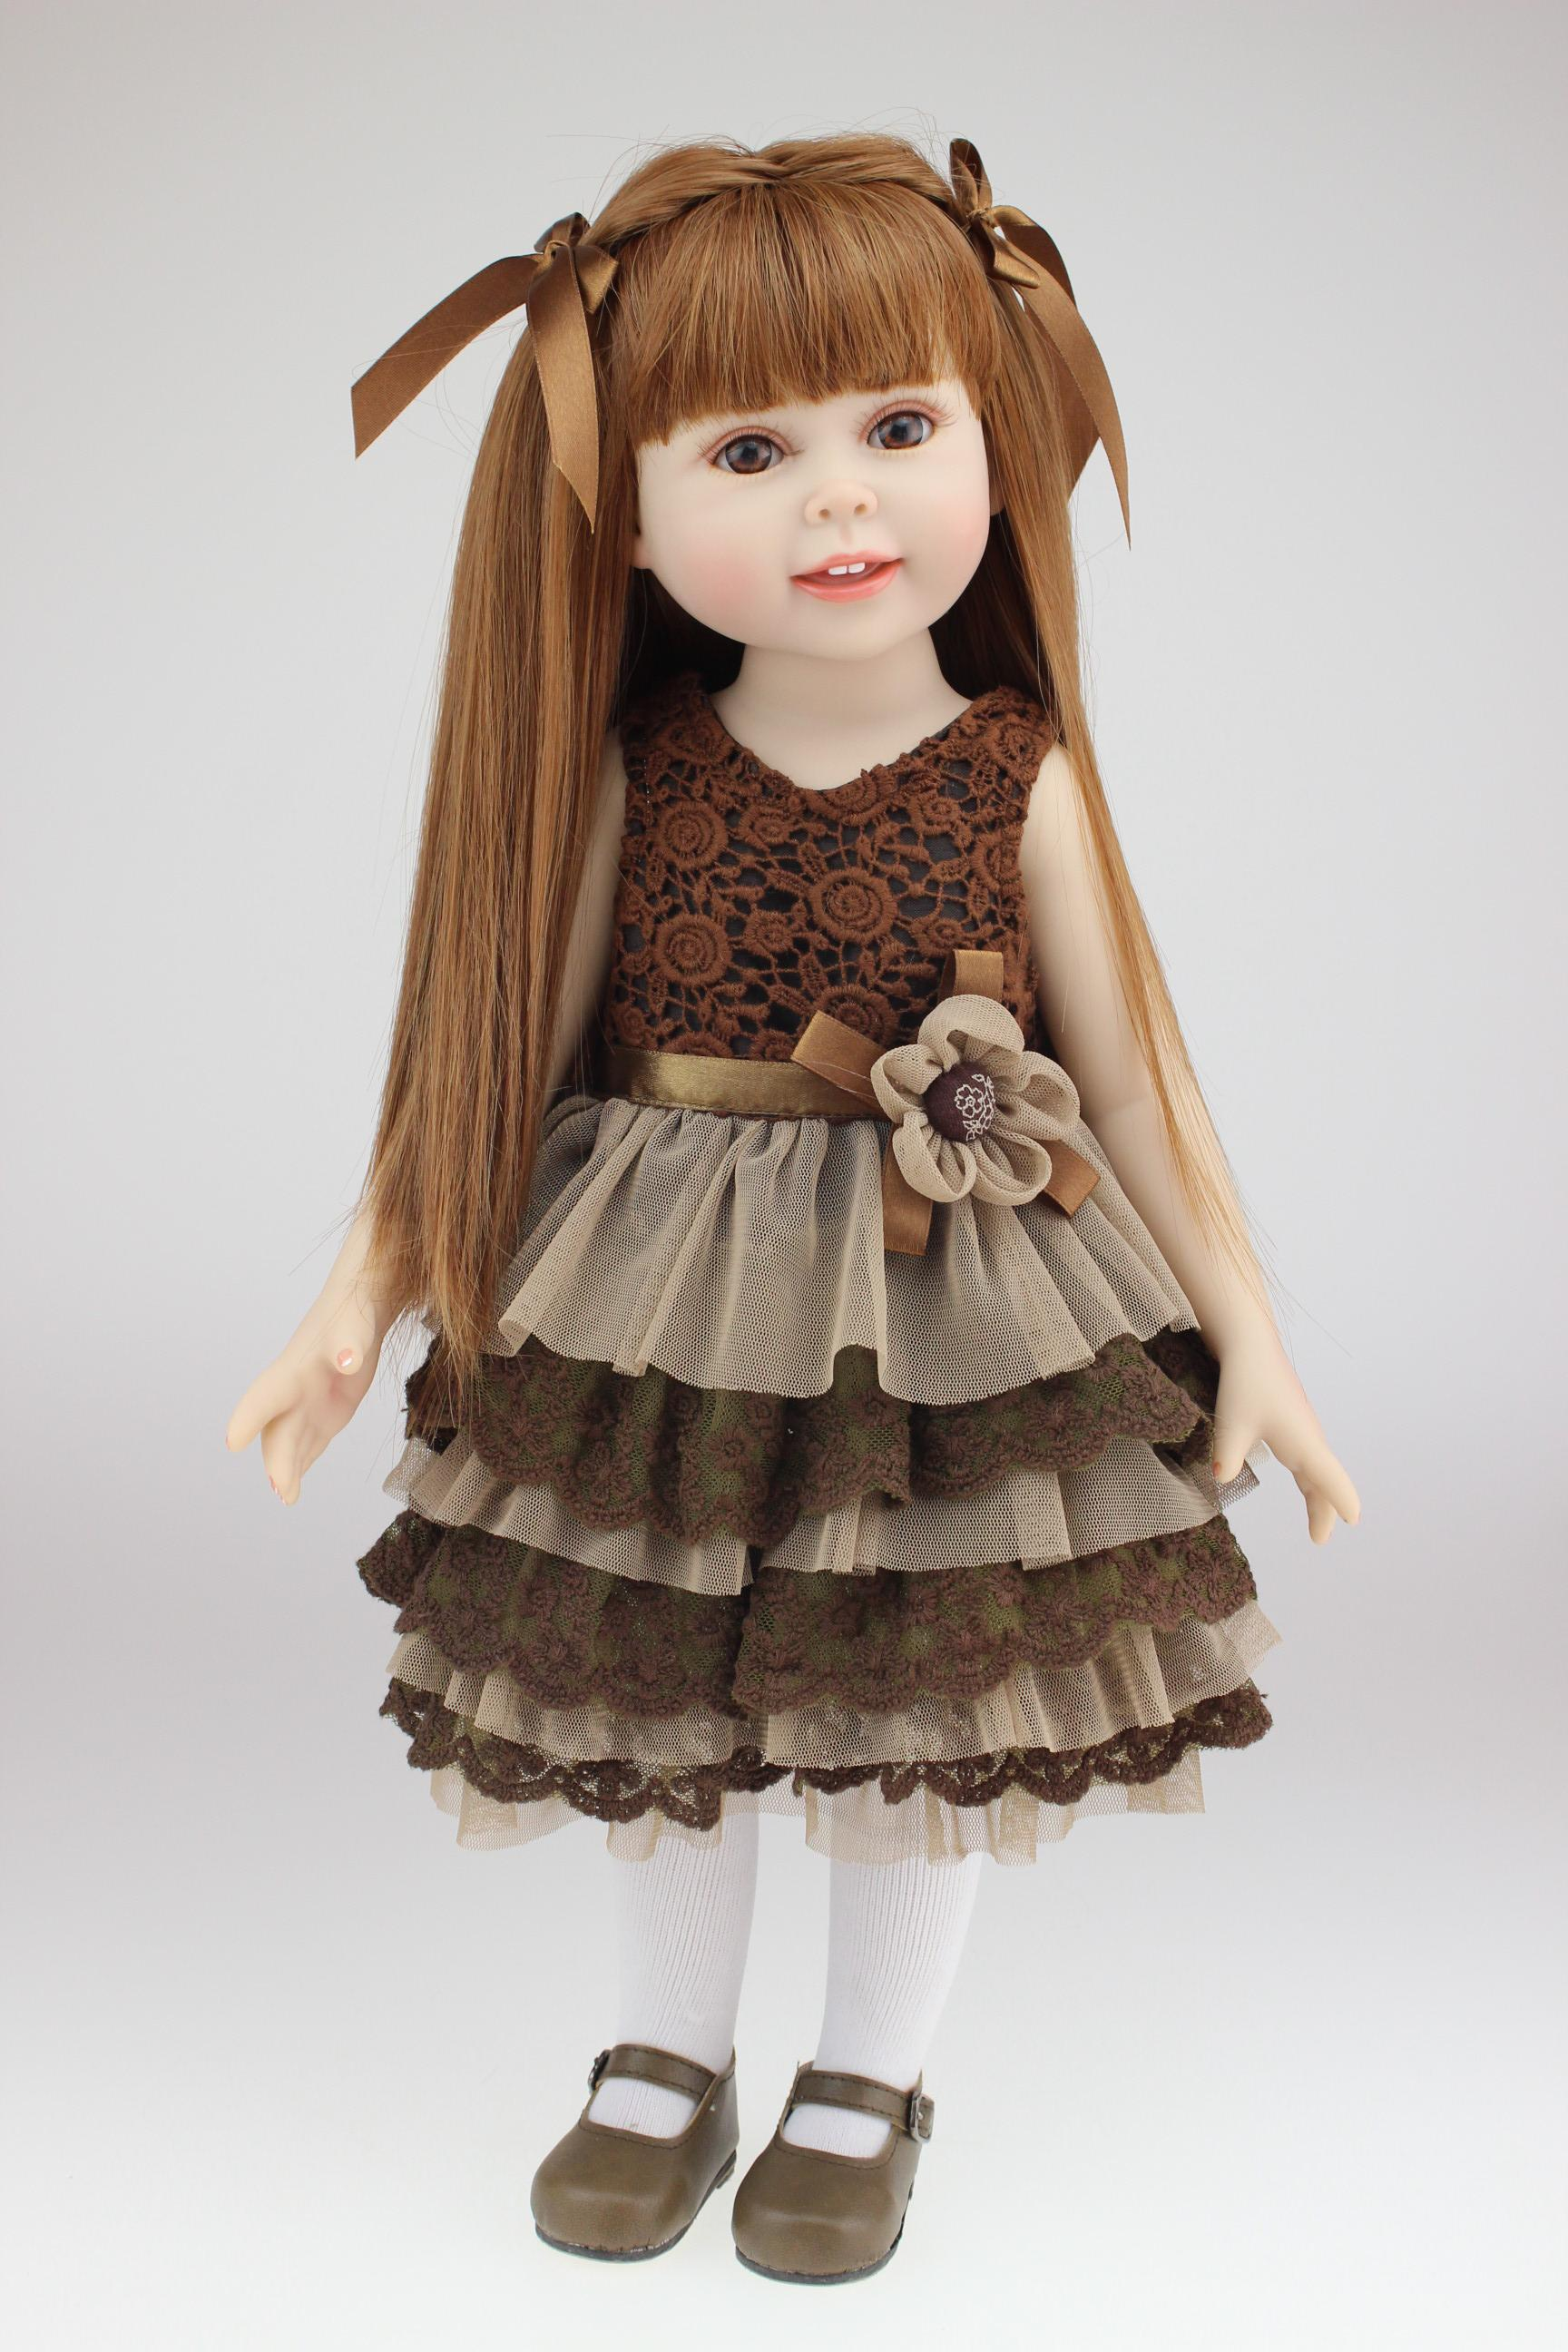 18 Inch American Girl Fashion Doll Realistic Girl Doll Finished ...